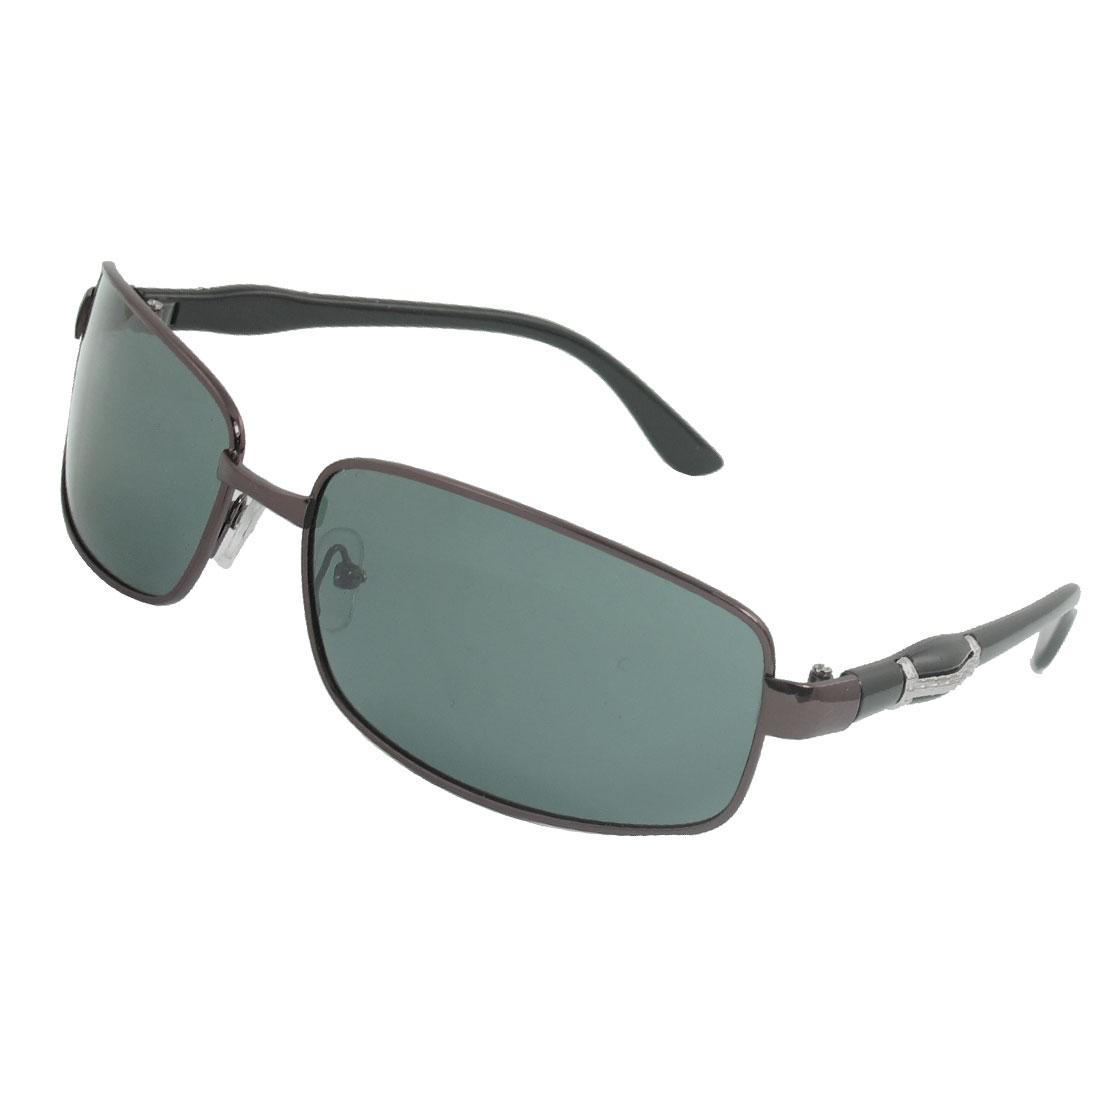 Men Coffee Color Metal I Decor Plastic Arms Sports Polarized Sunglasses